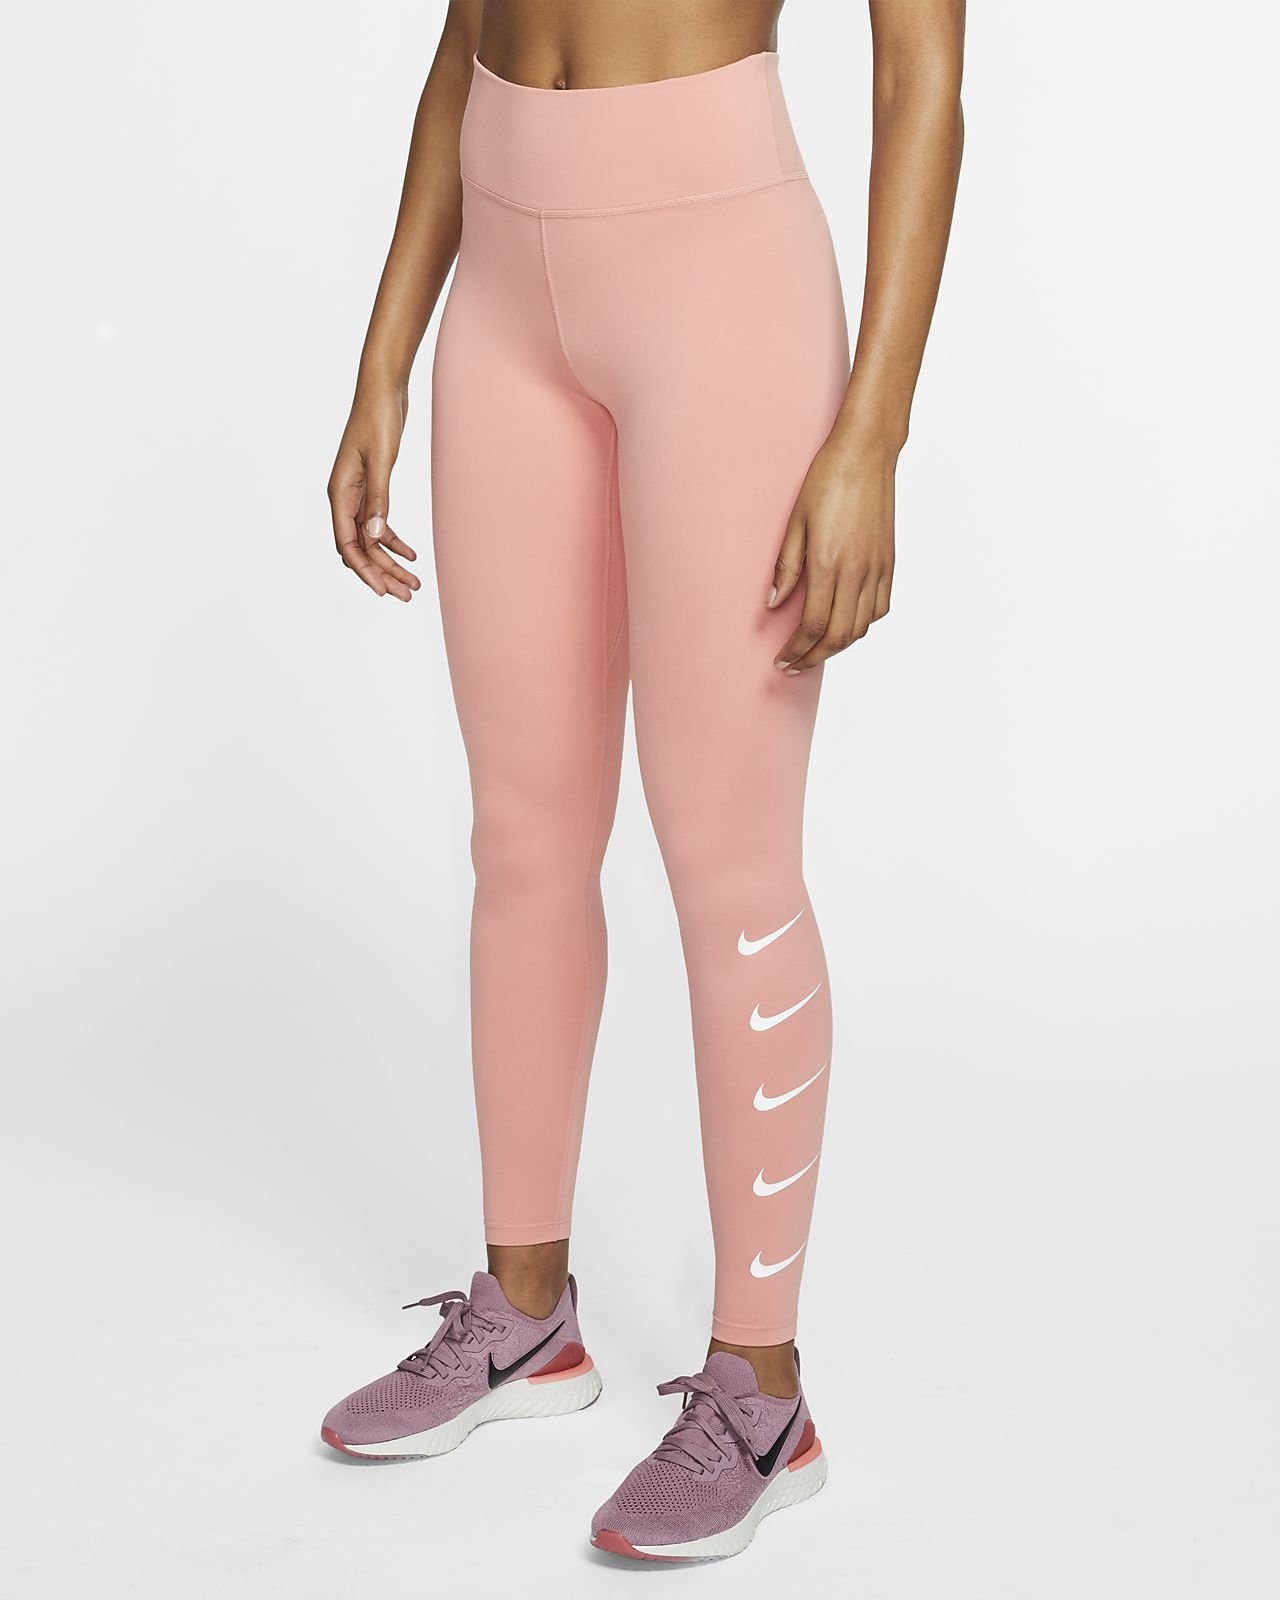 Nike Swoosh Hardlooptights voor dames